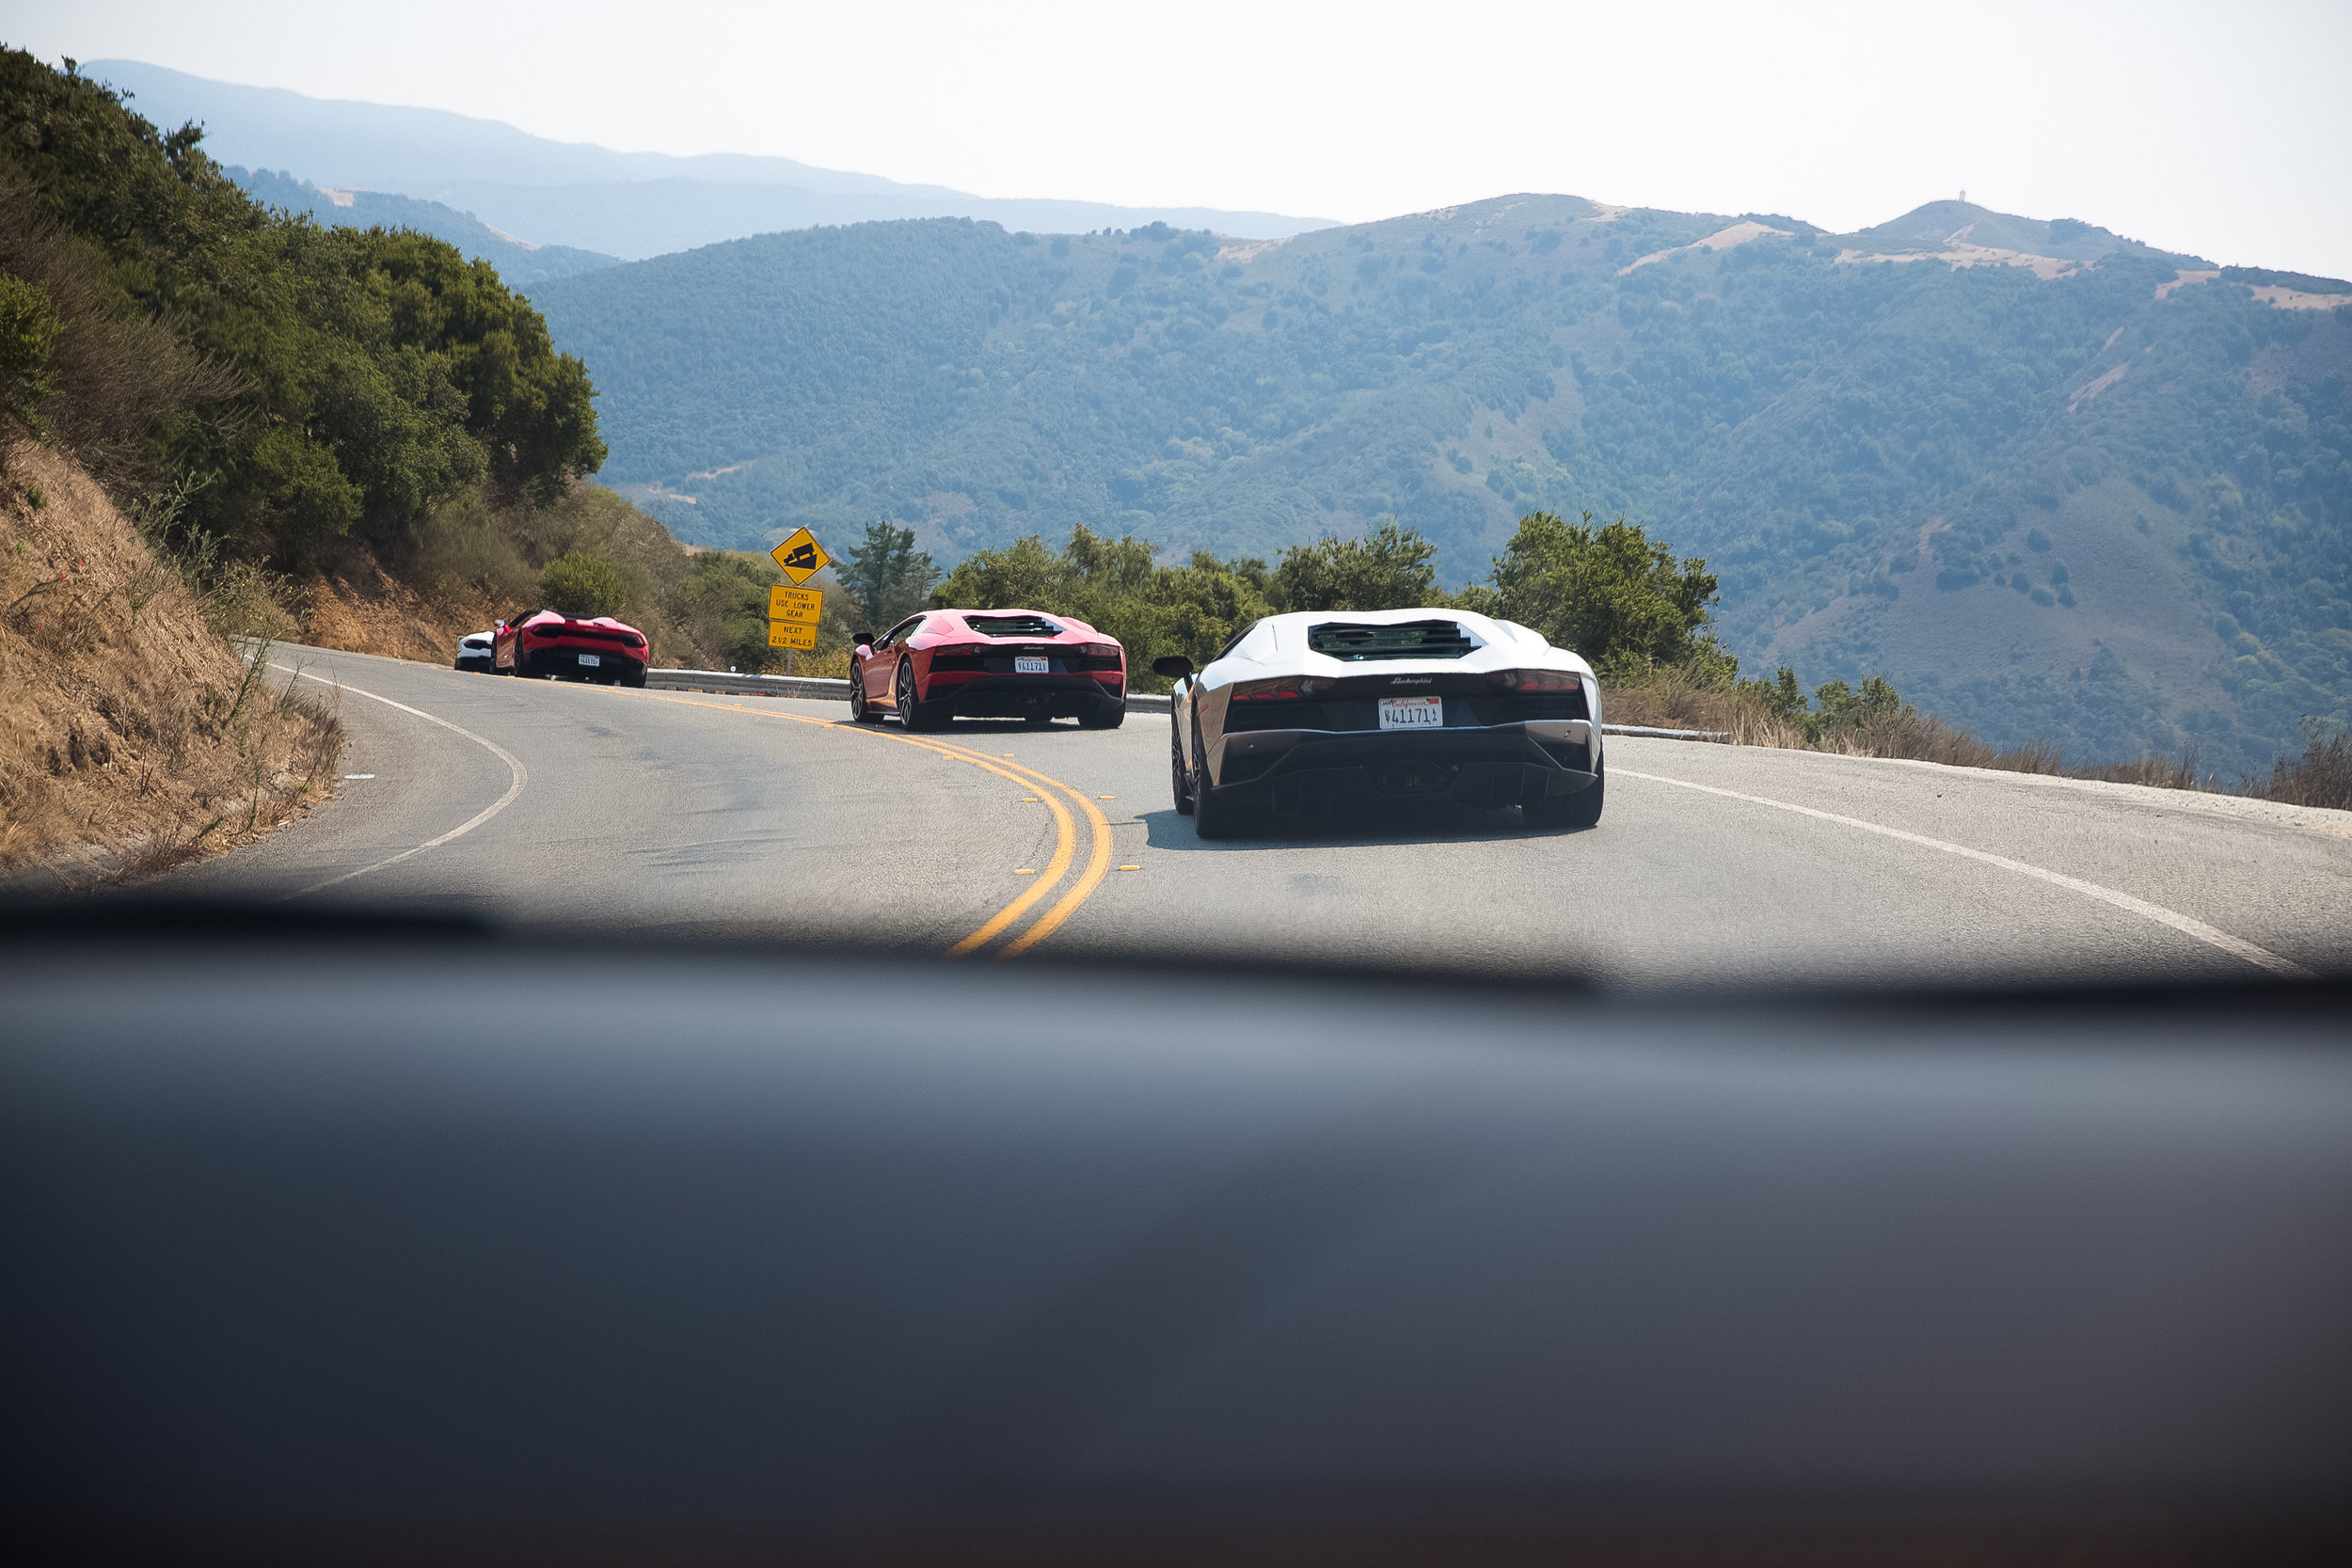 Stay_Driven_Monterey_TW-1-6.jpg